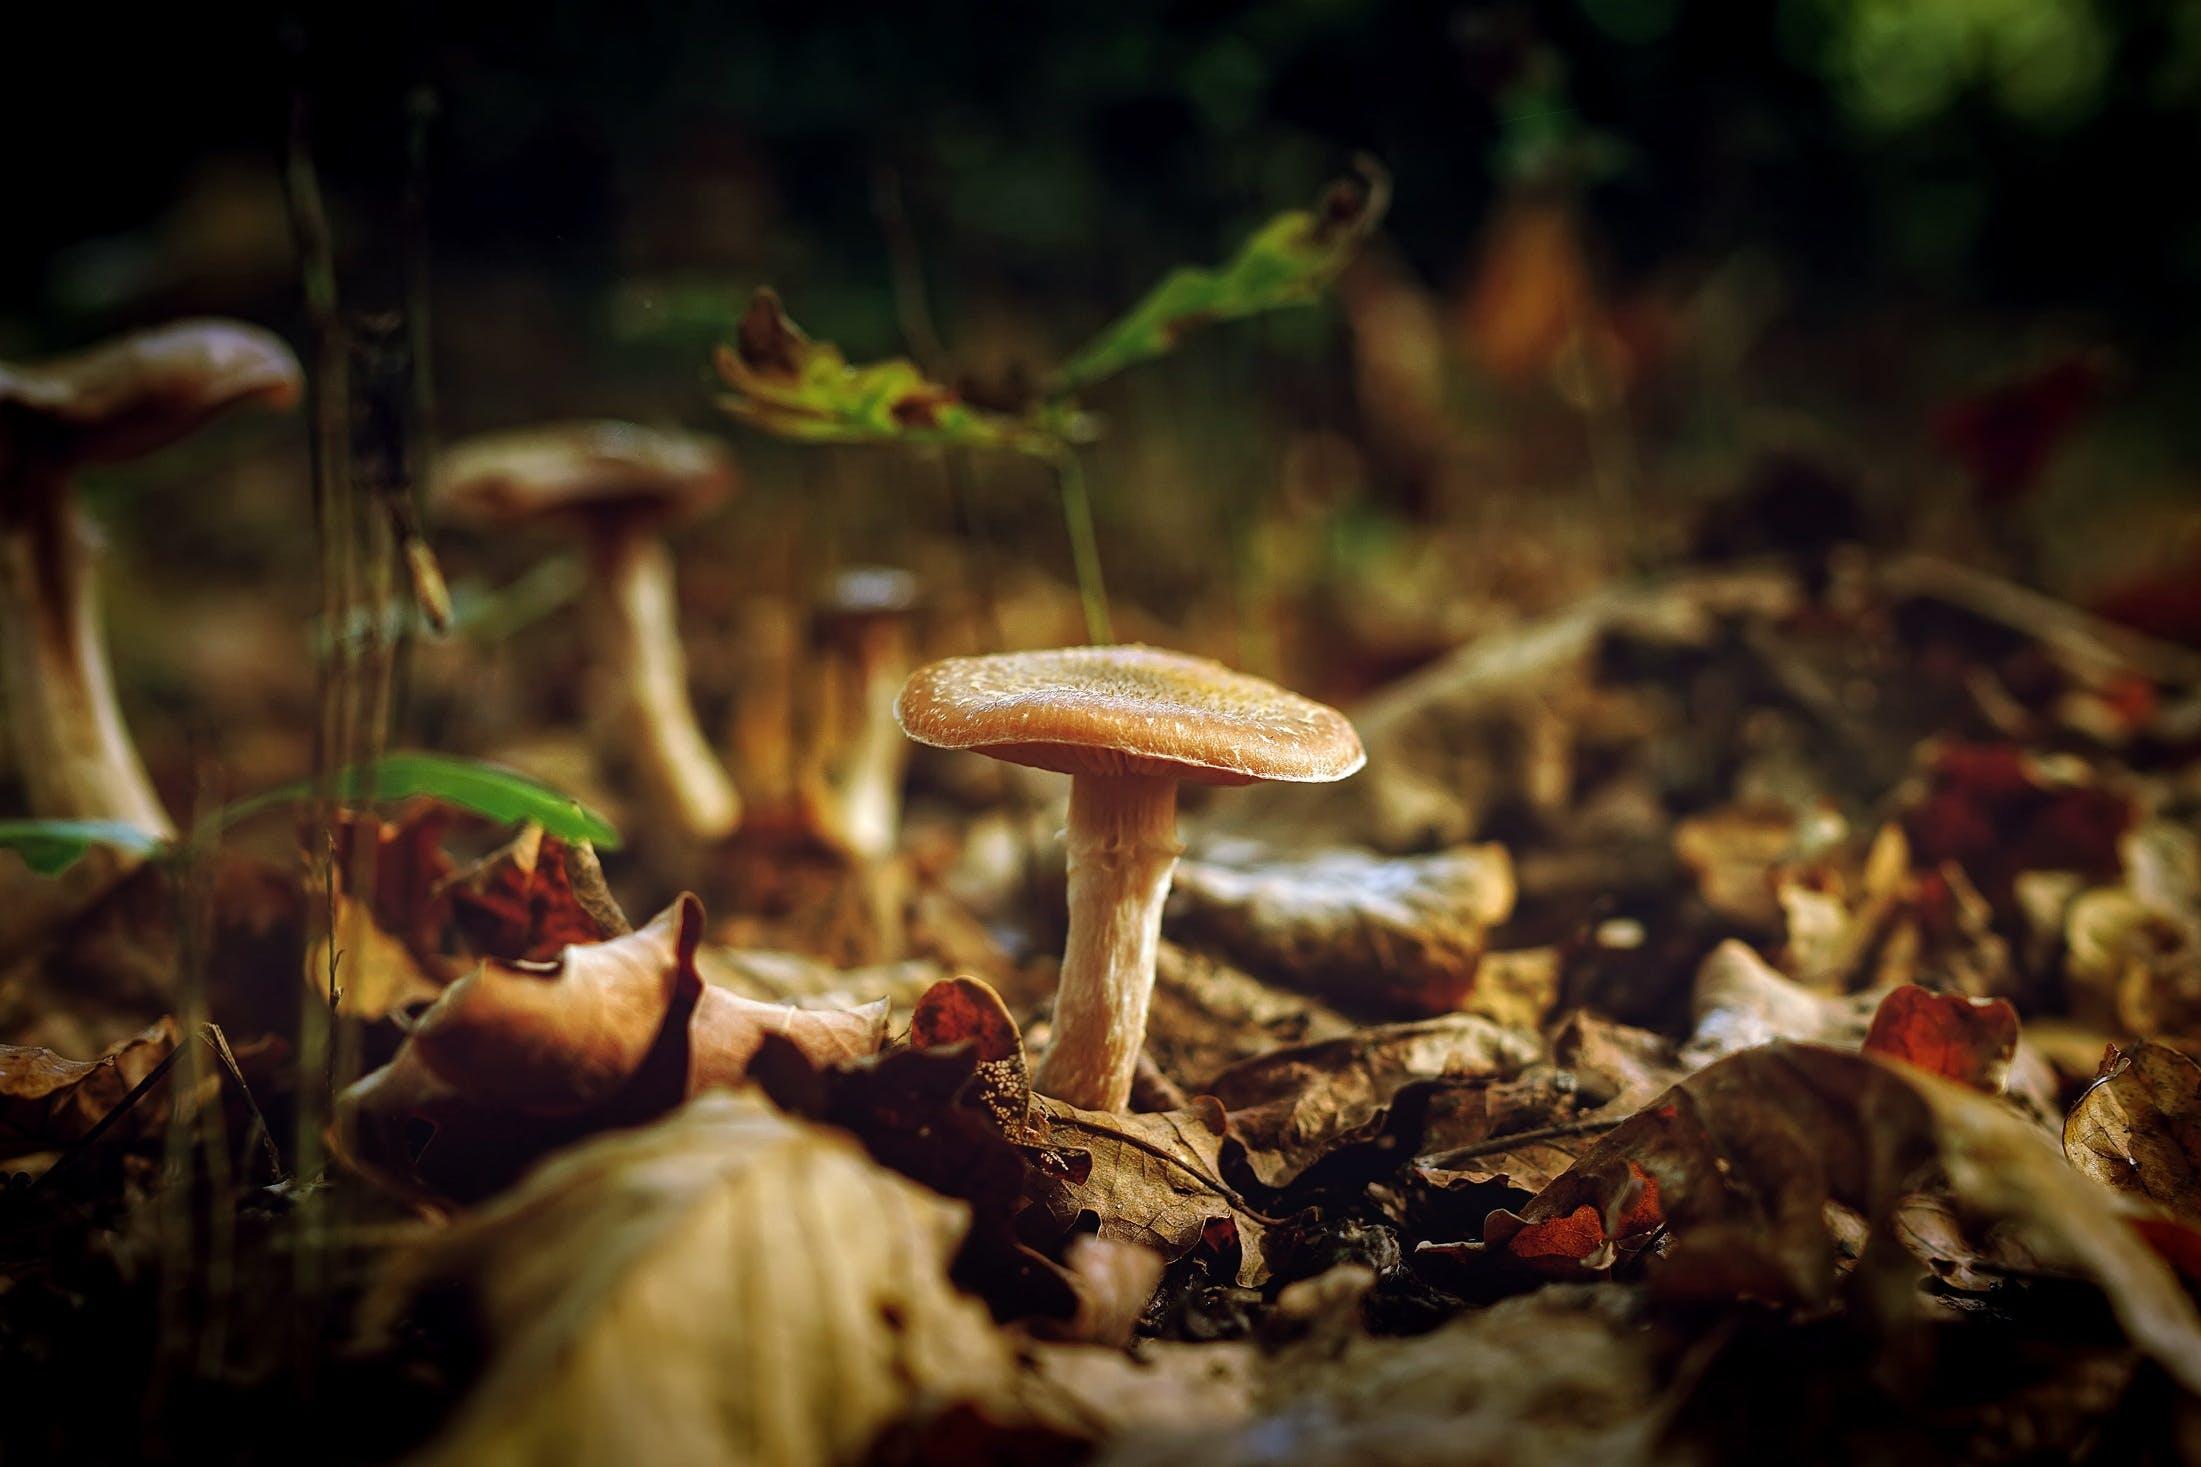 Kostenloses Stock Foto zu gefallene blätter, giftpilze, makro, pilze